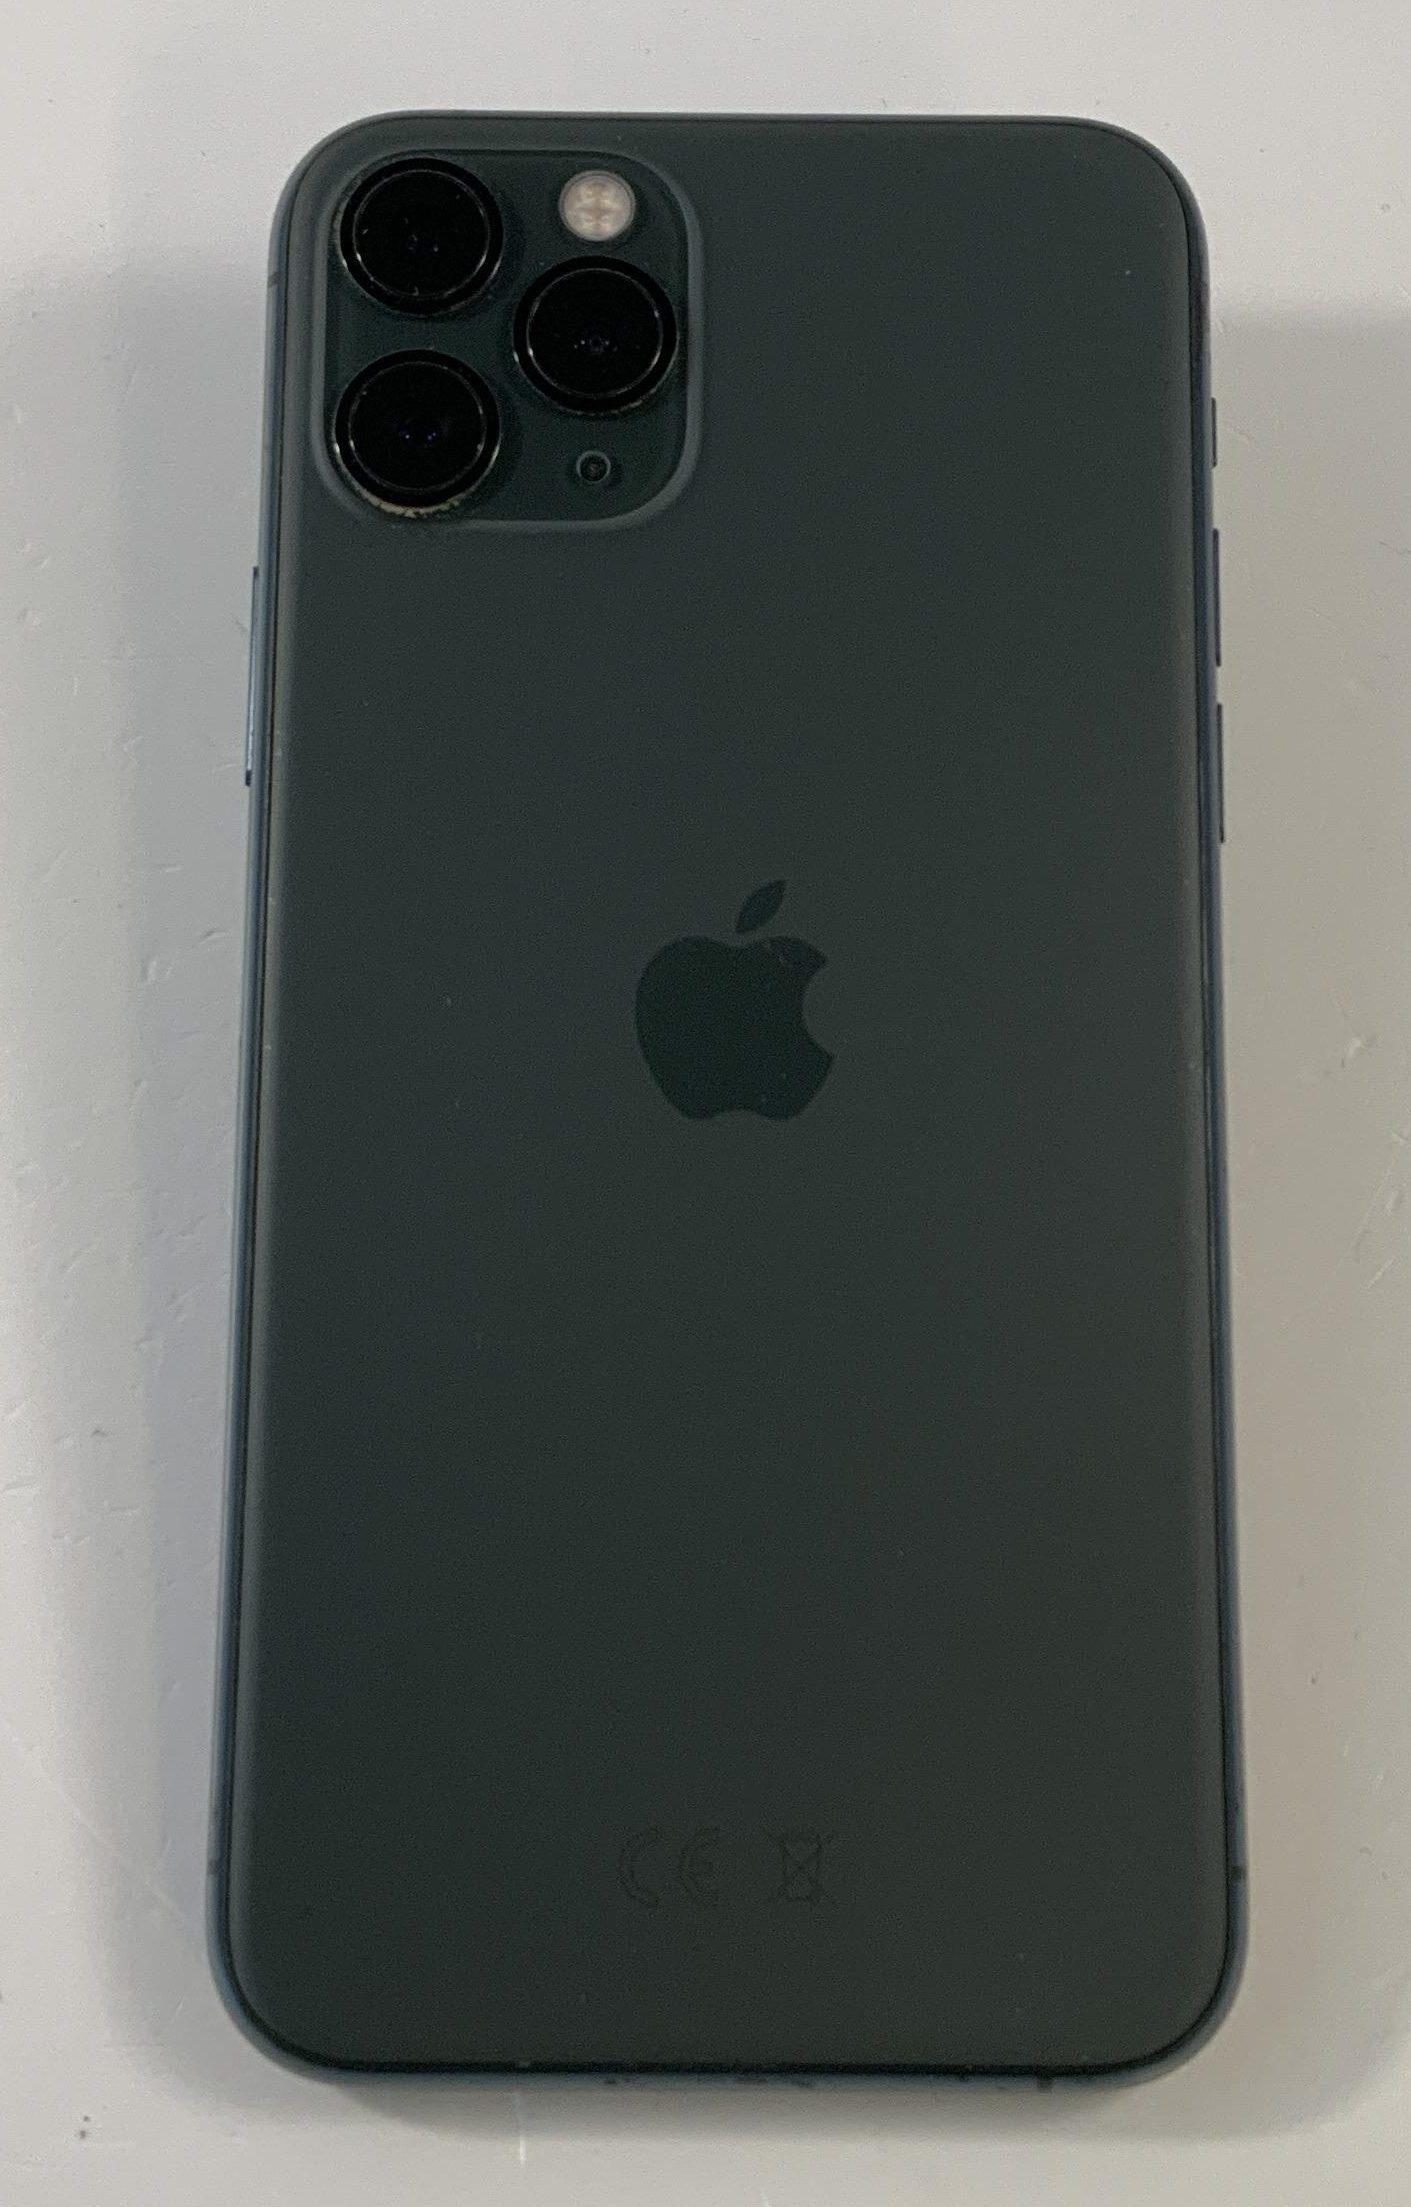 iPhone 11 Pro 256GB, 256GB, Midnight Green, Afbeelding 2